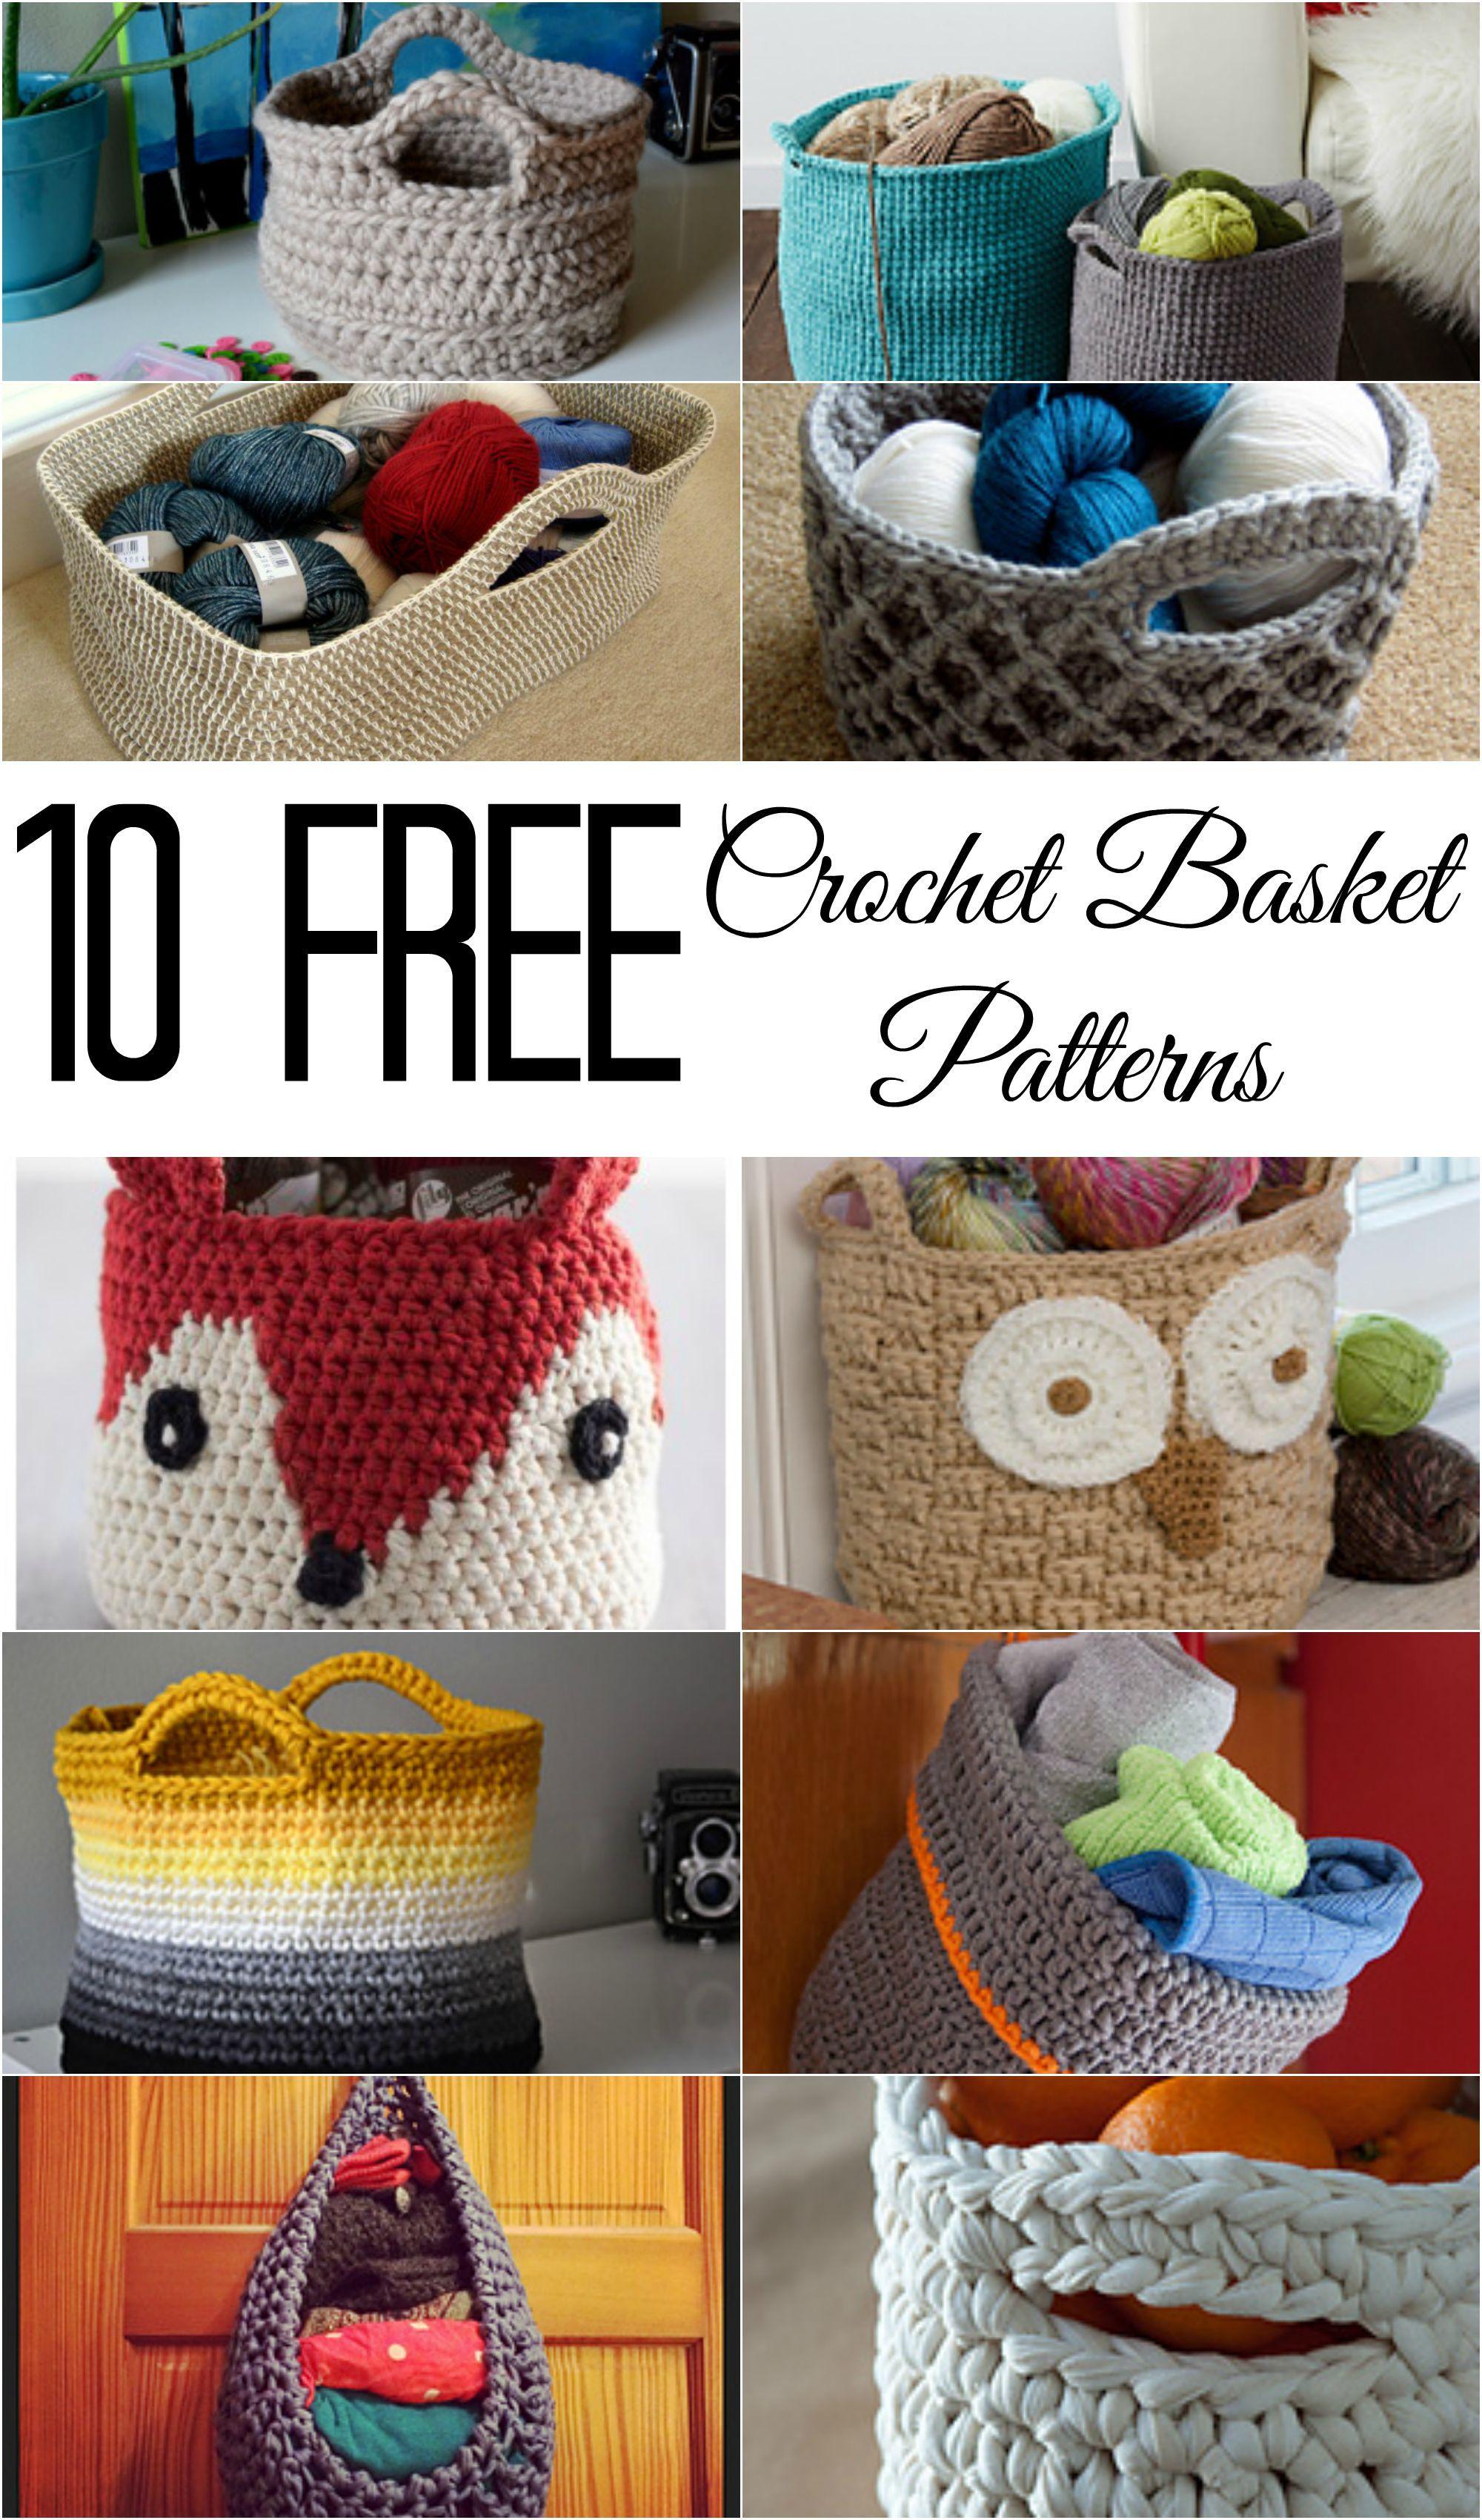 10 Free Crochet Basket Patterns | HÄKELWAHN | Pinterest | Häkeln ...